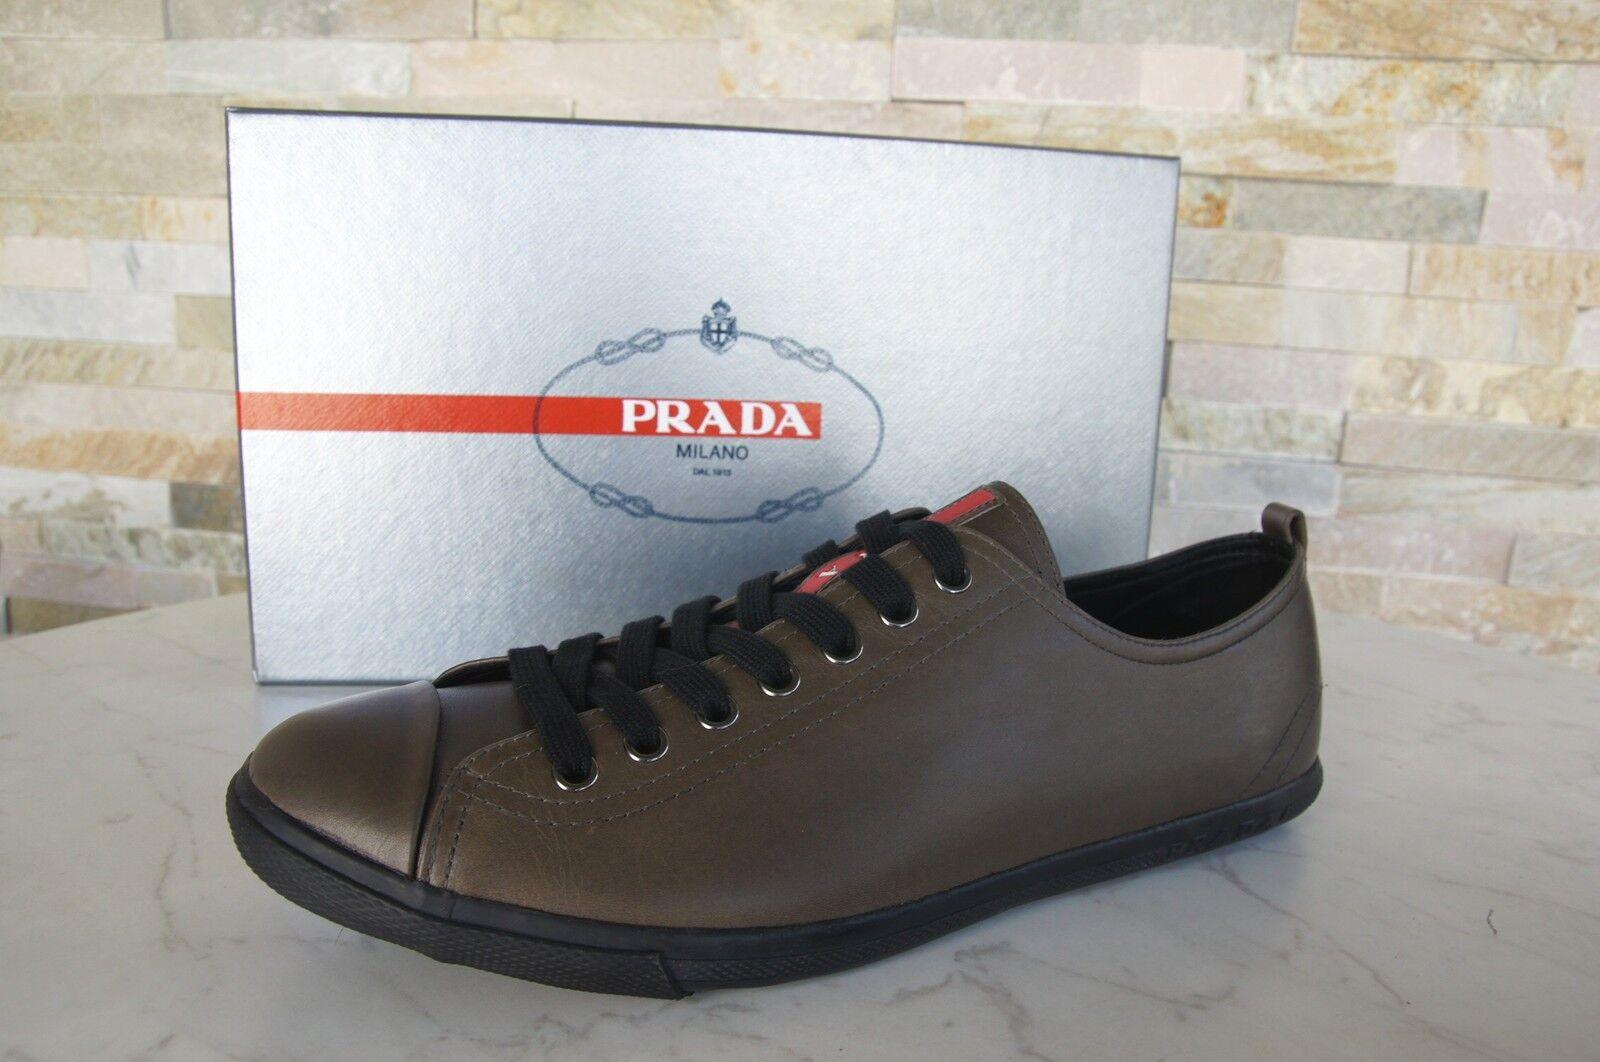 Prada Sneakers Gr 44,5  10,5  Sportschuhe Schnürschuhe Schuhe Schuhes stein neu